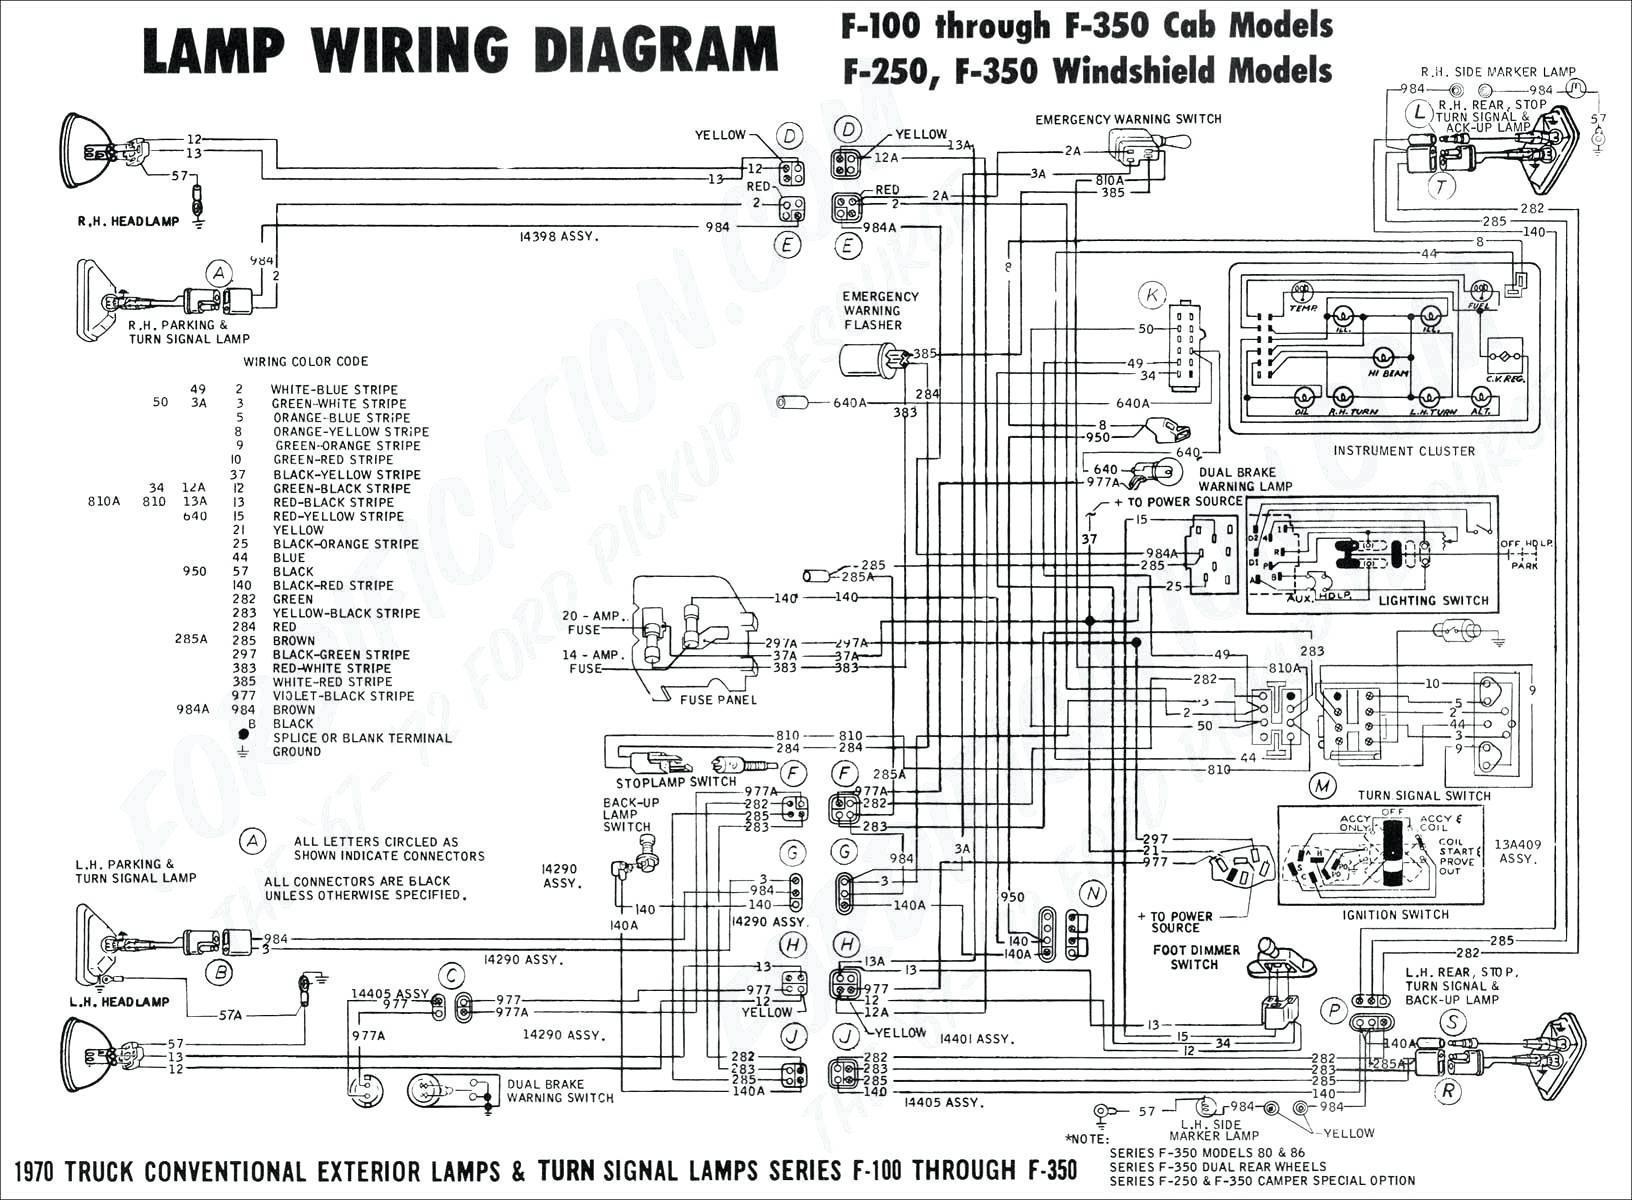 ac wiring diagram 1995 monte carlo